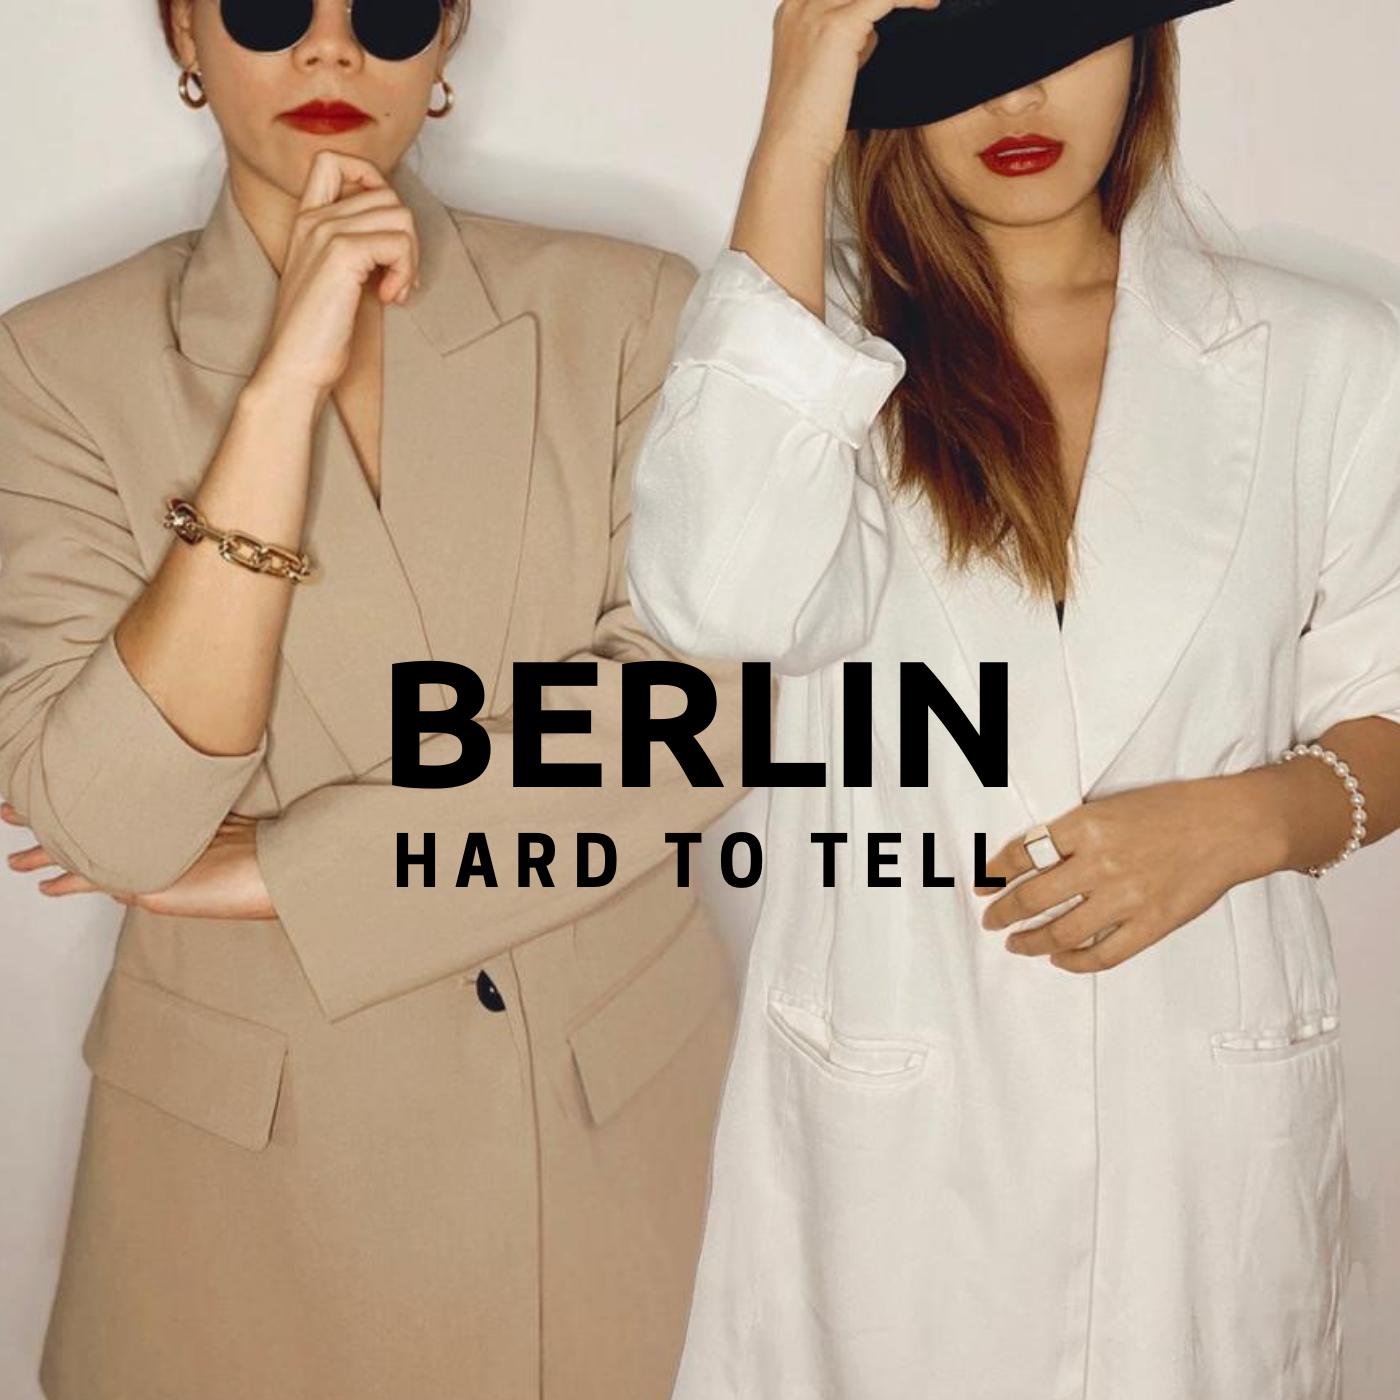 EP01 在德國上學跟台灣有什麼不一樣?德國人真的一板一眼?來柏林三年後的成長 | Wine